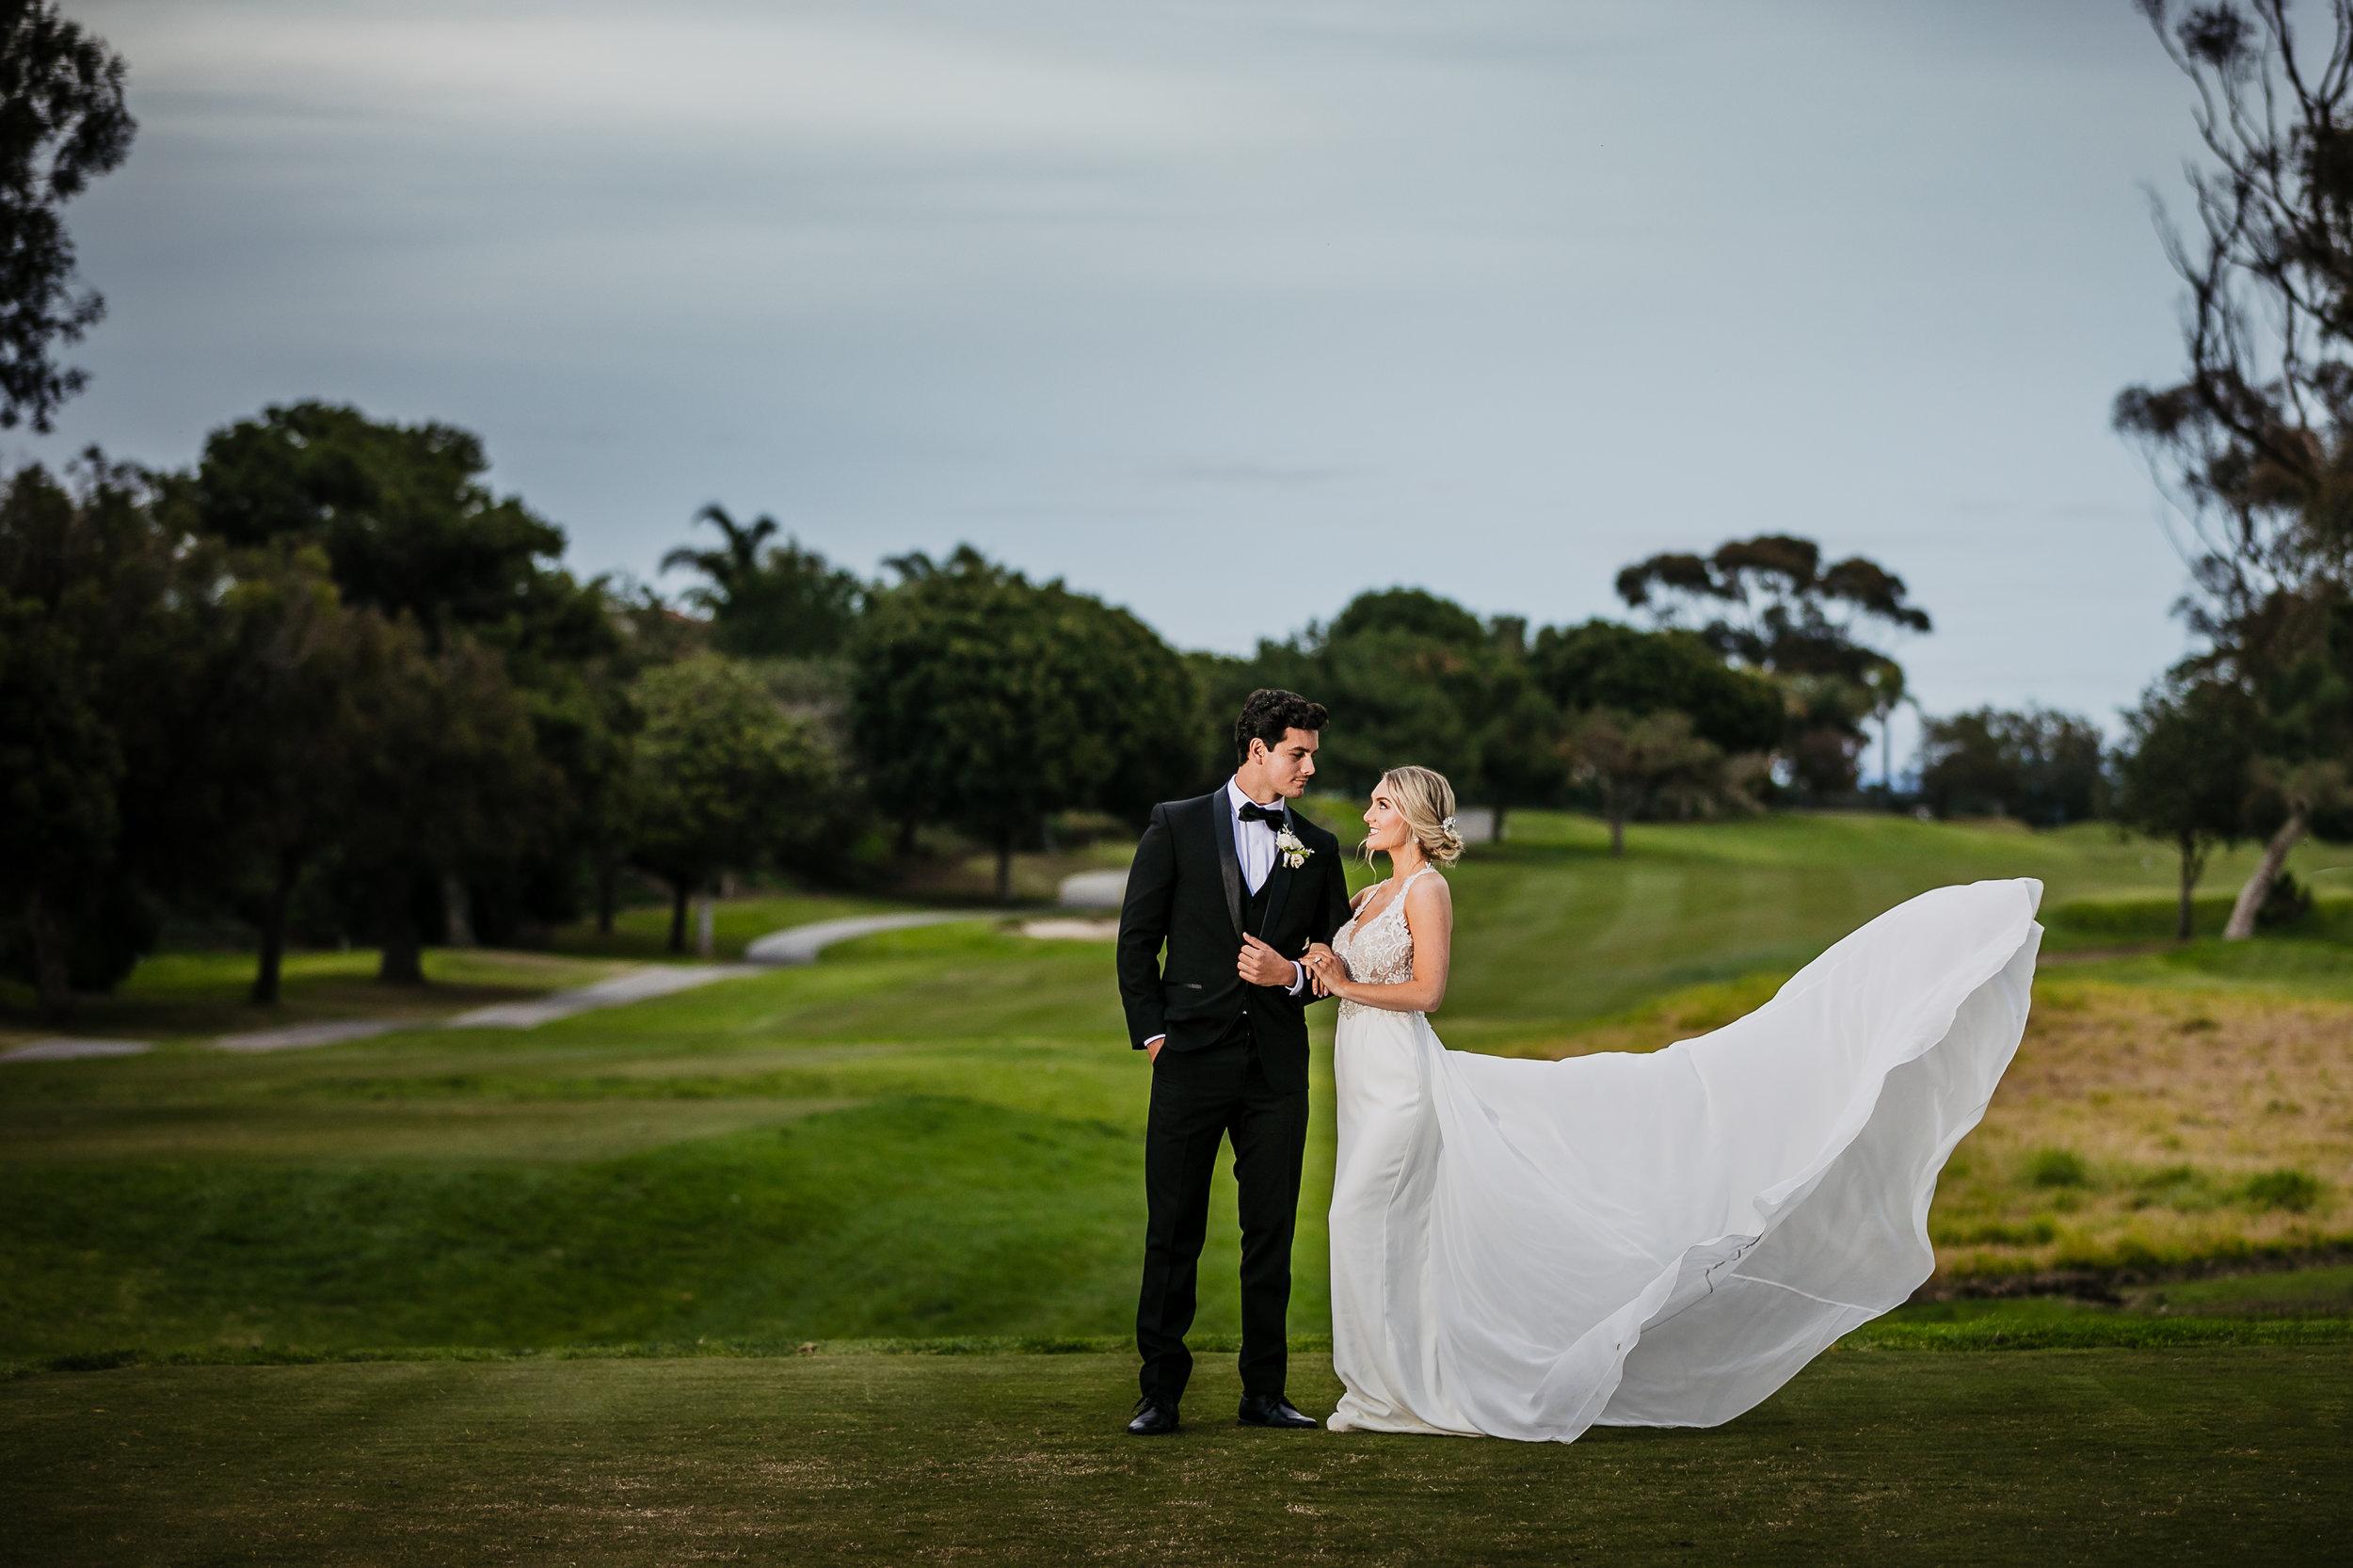 Sea-Cliffe-Country-Club-Huntington-Beach-Wedding-Photography 116.jpg